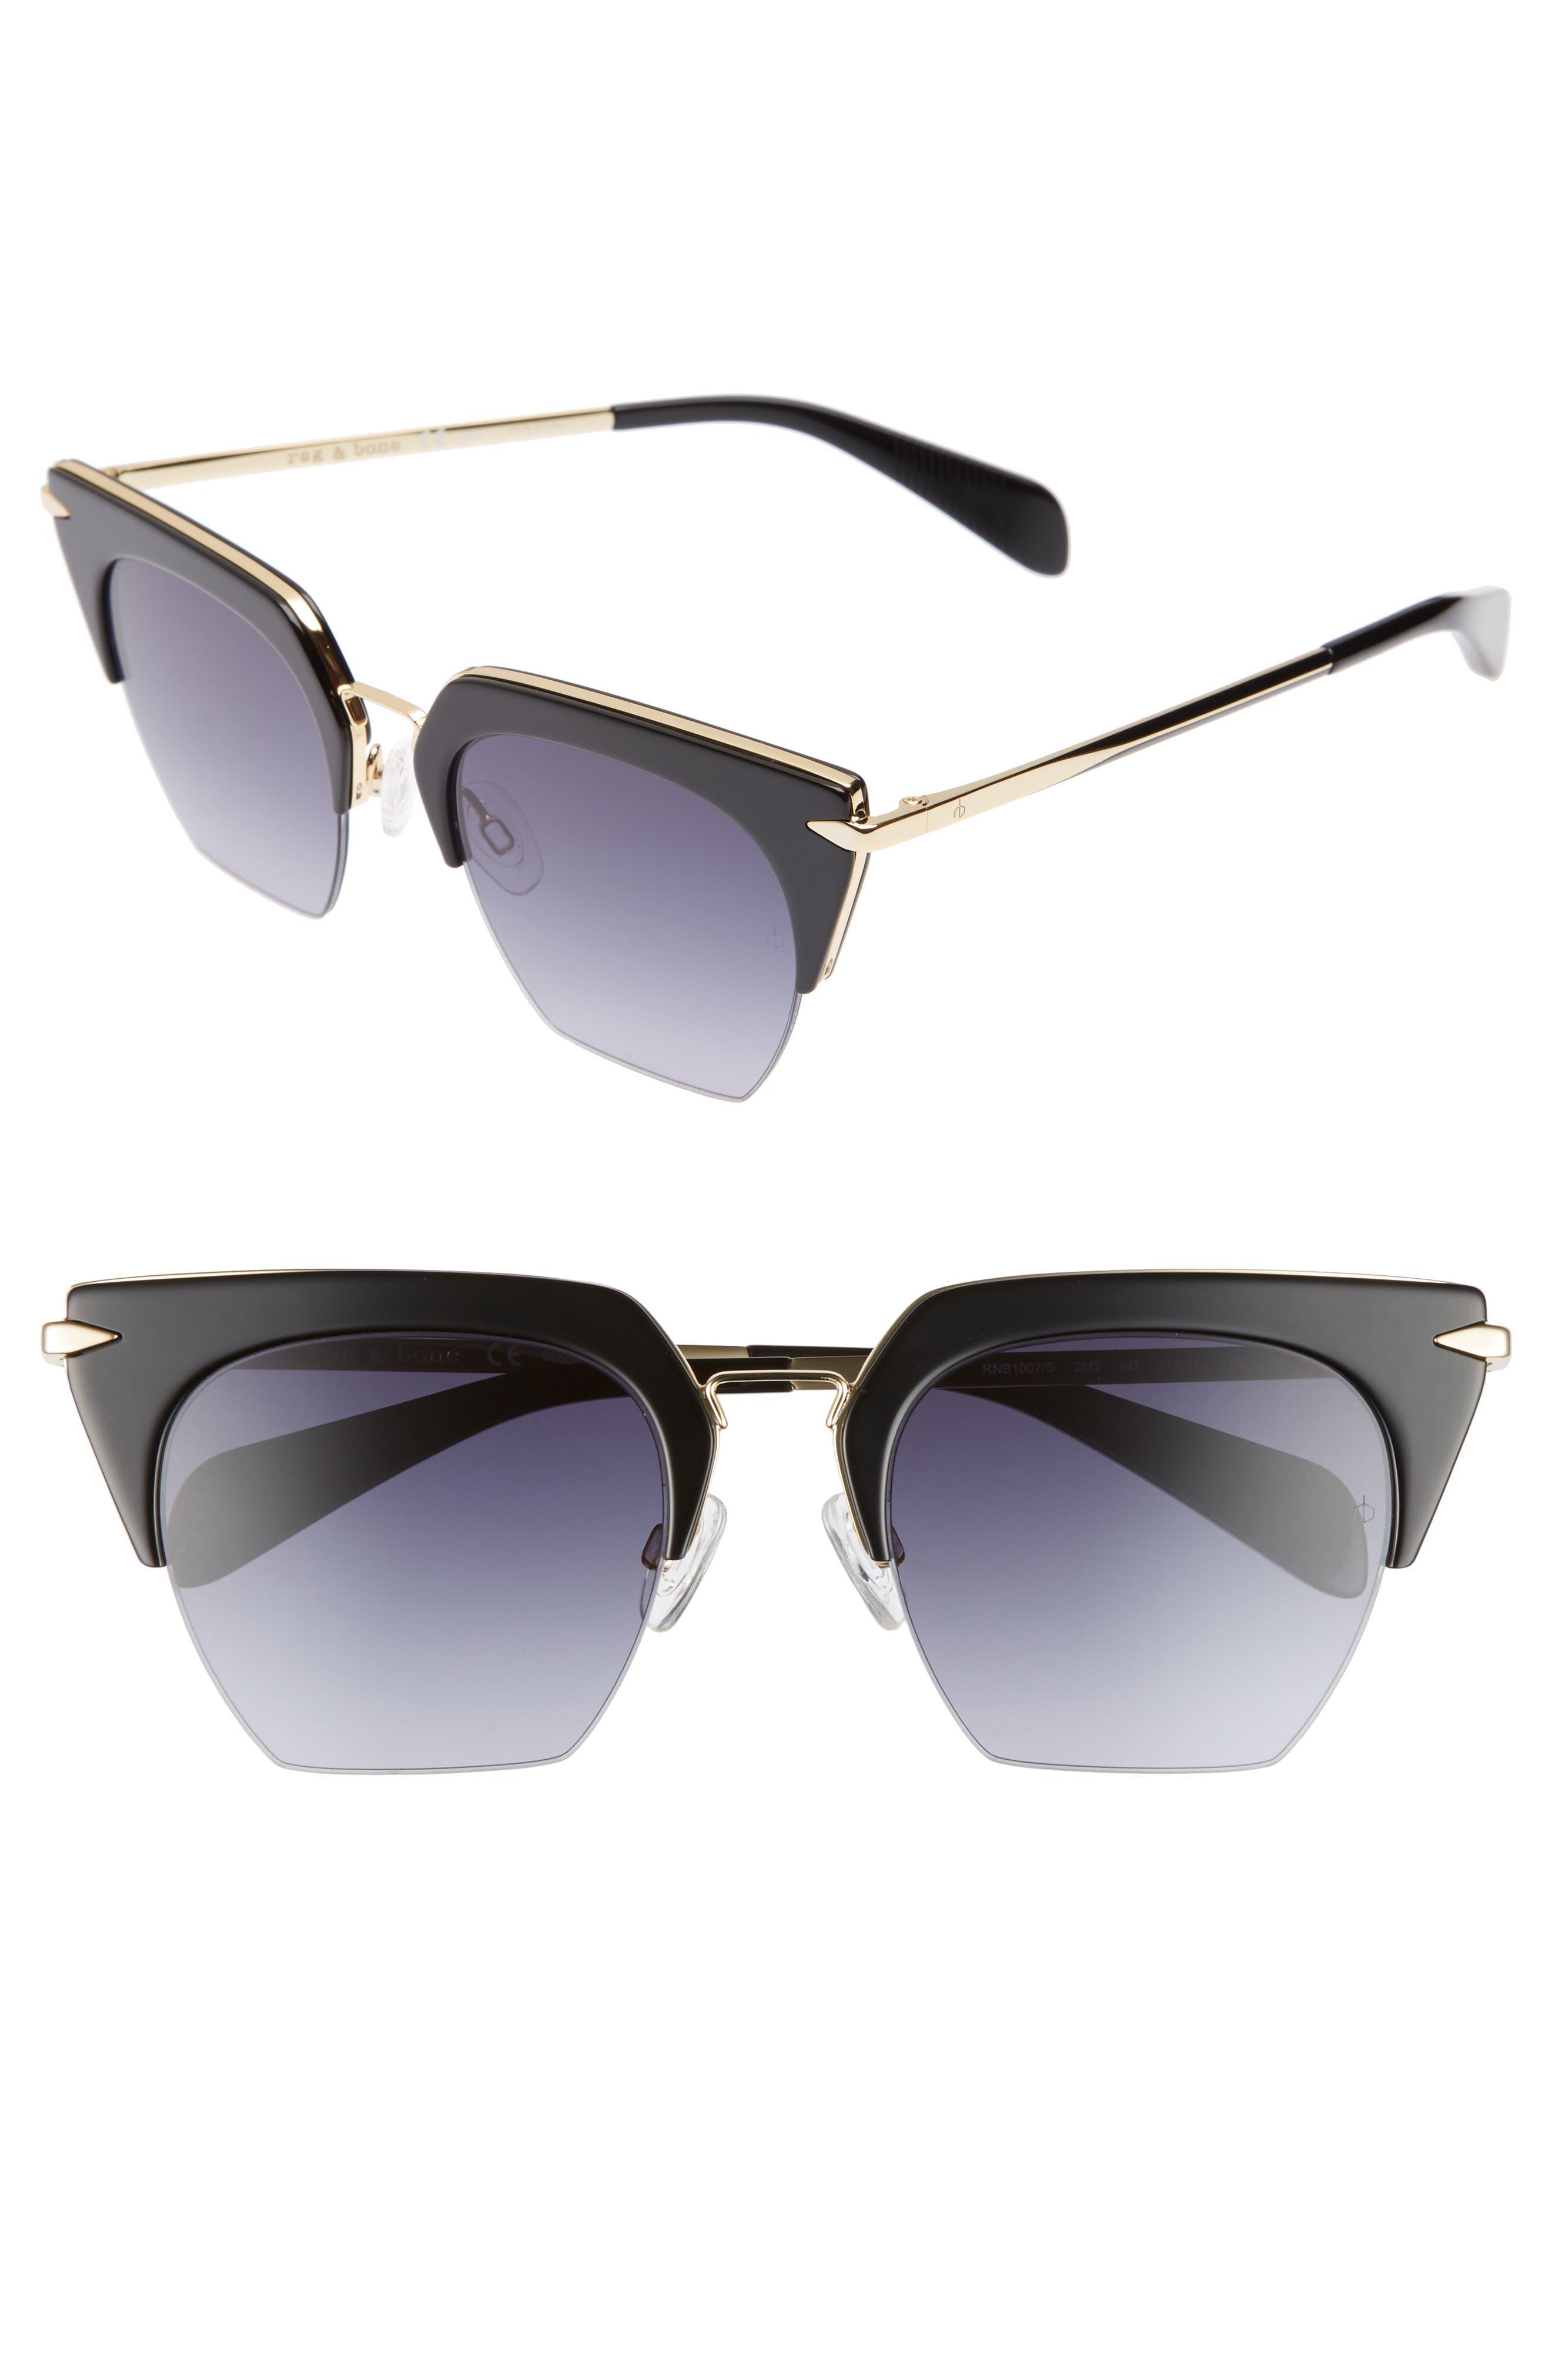 51mm Cat Eye Sunglasses,                             Main thumbnail 1, color,                             BLACK/ GOLD